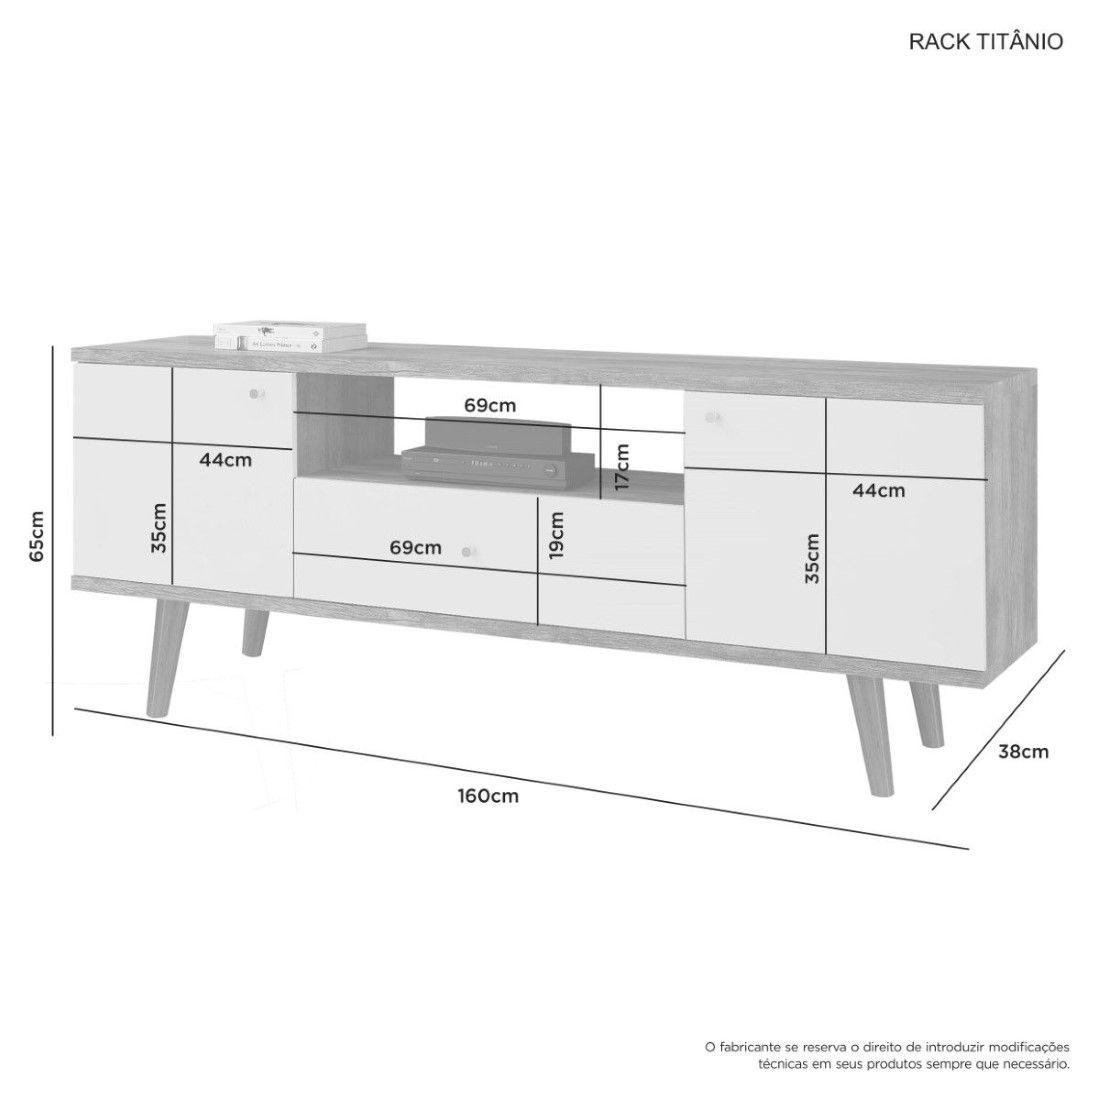 Conjunto Retrô Rack/Painel Titânio 60'' JCM Movelaria